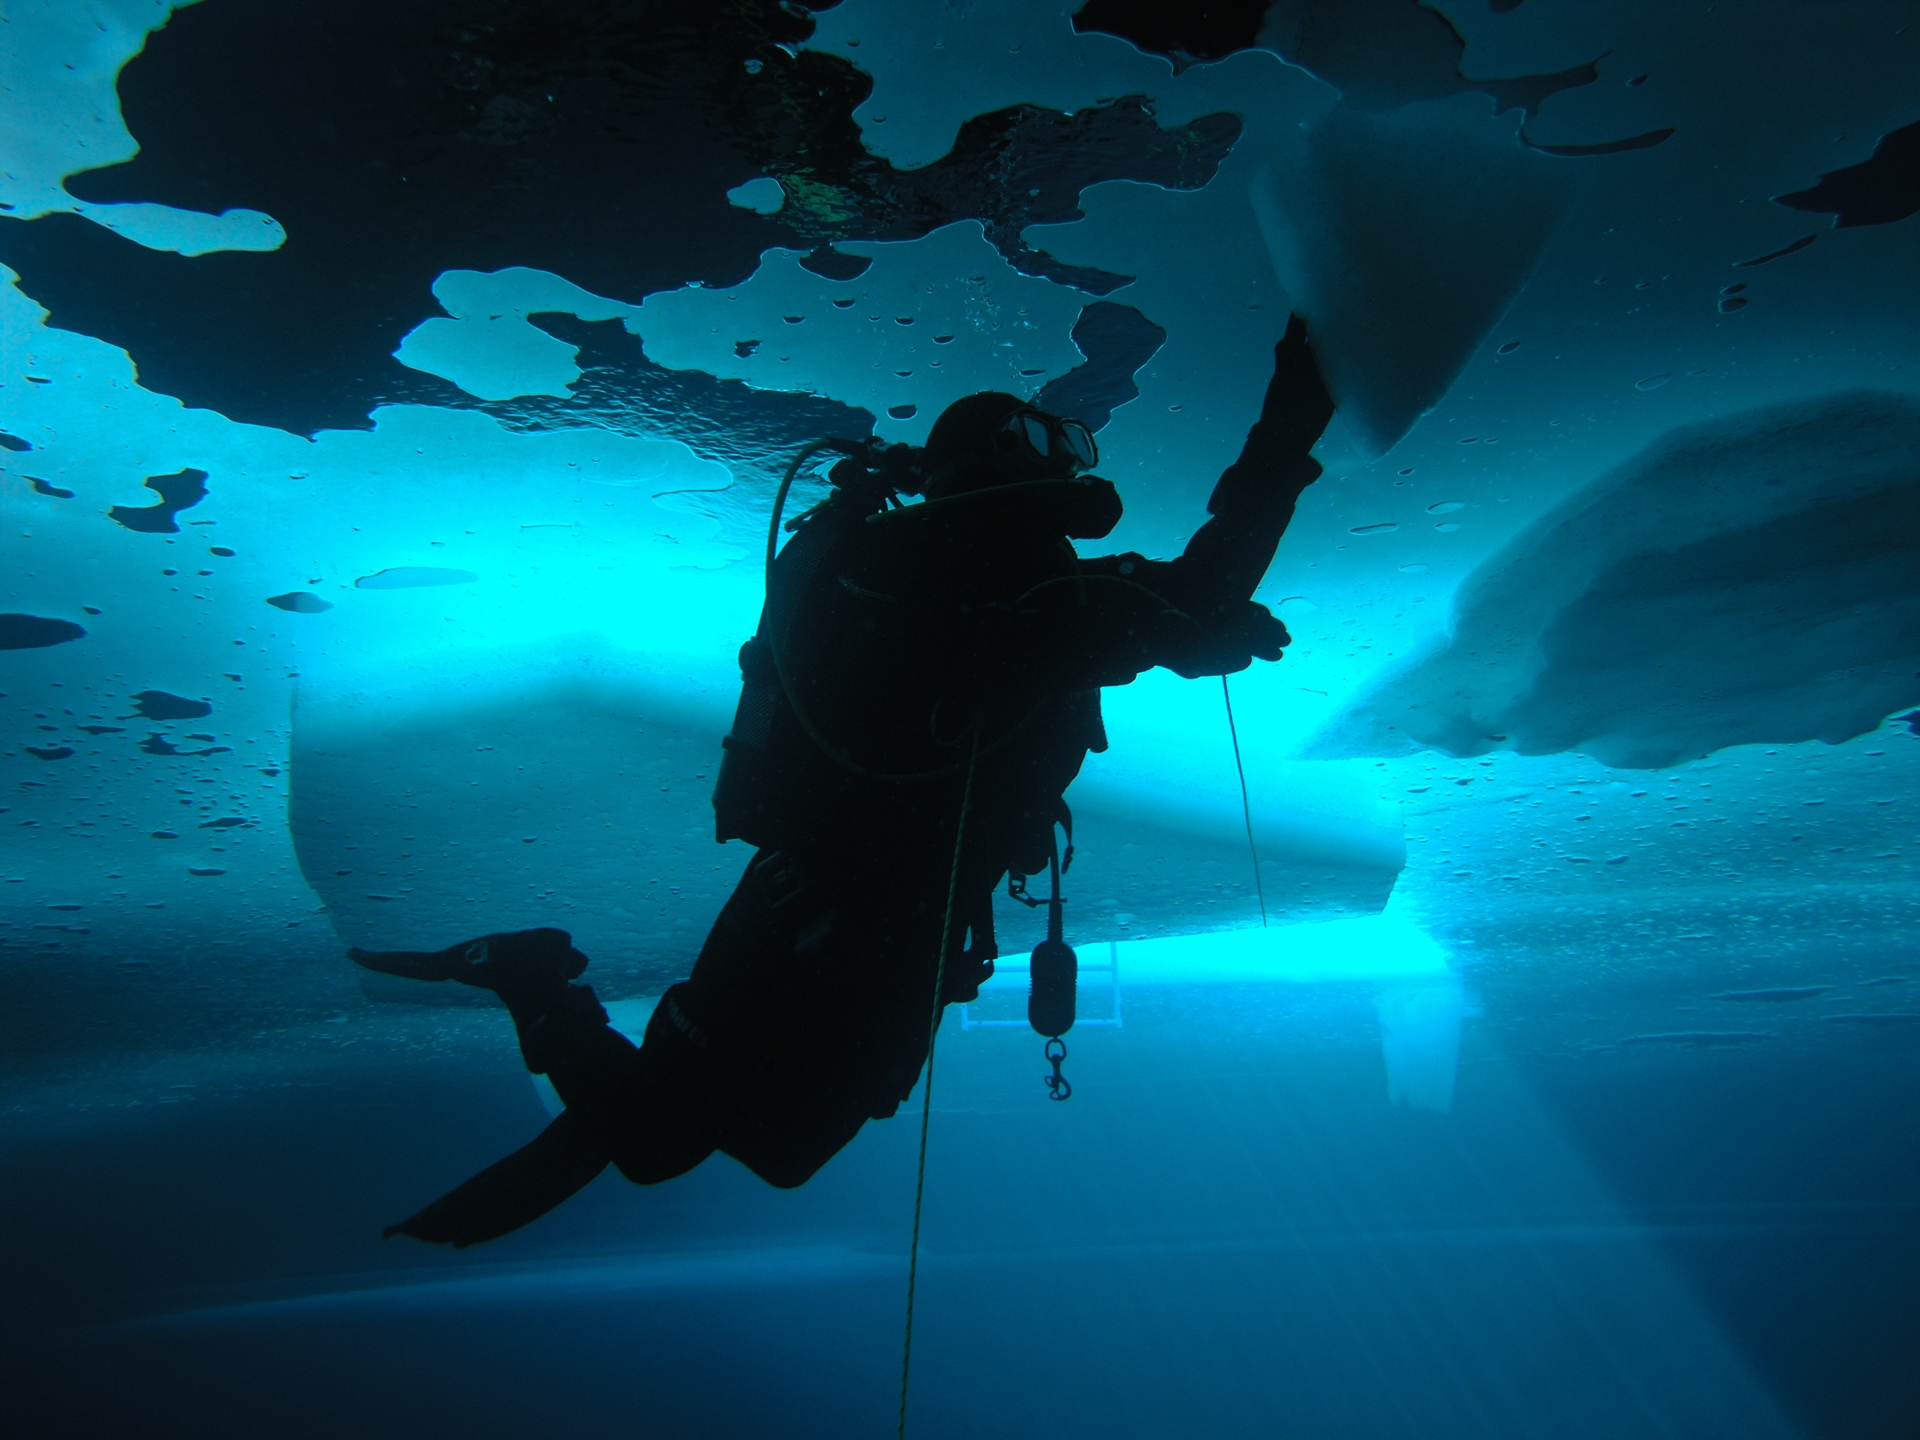 innerspace - ice diving - marcsinbox | ello